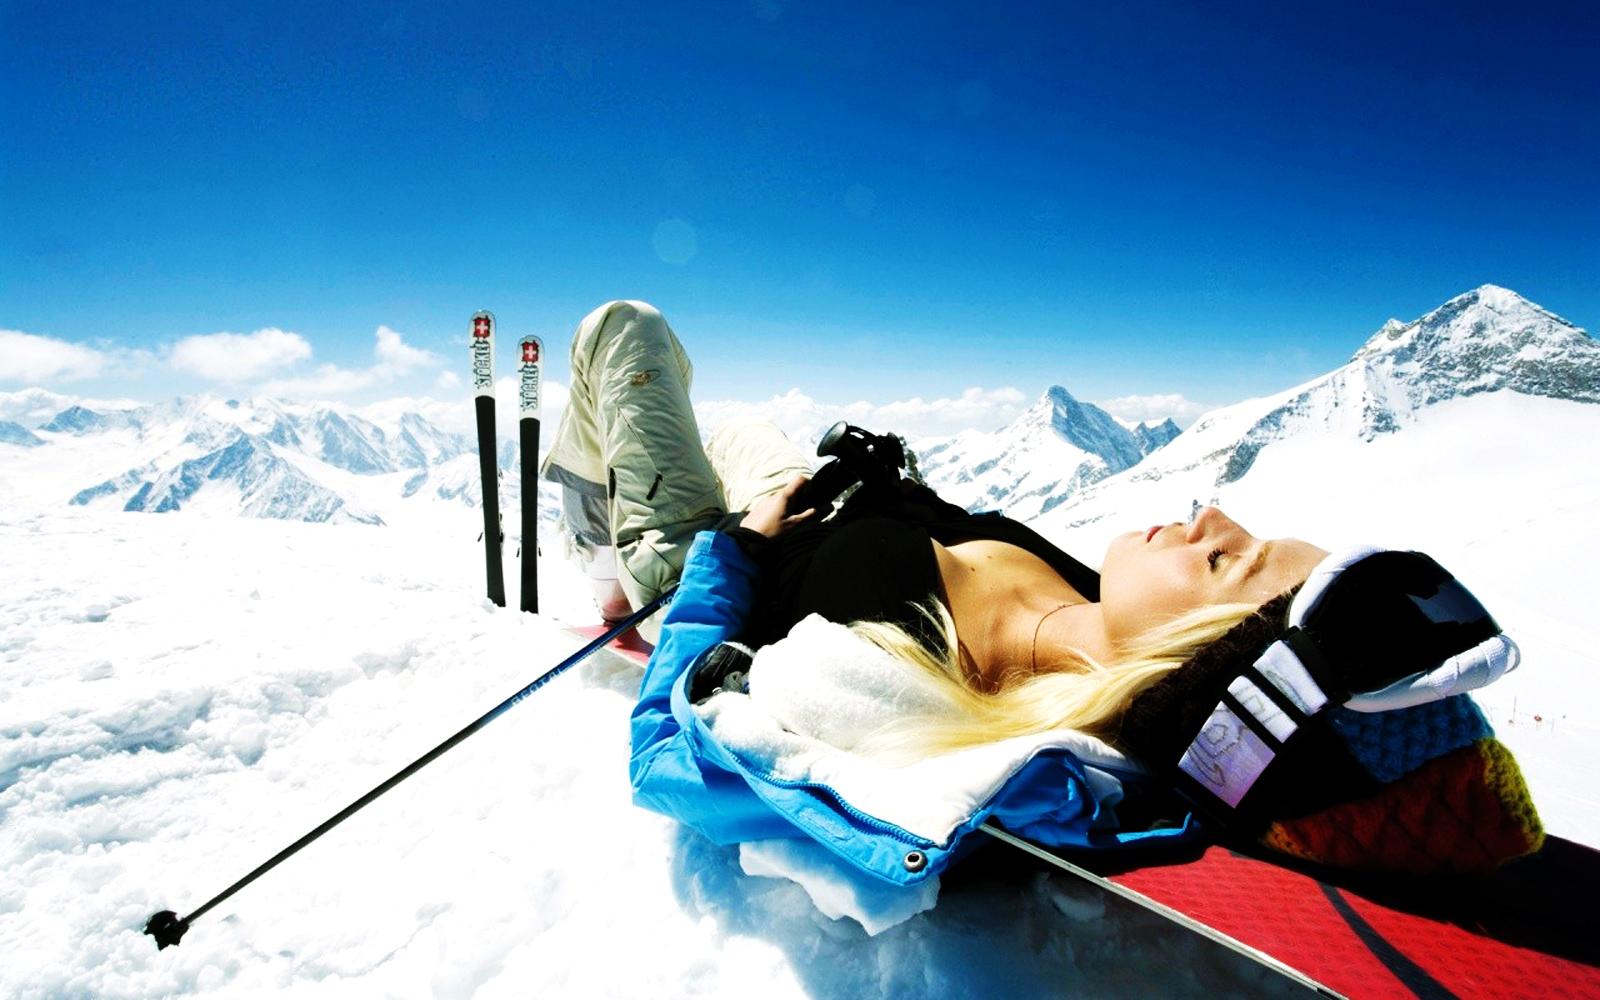 Central wallpaper january 2012 - Ski wallpaper ...